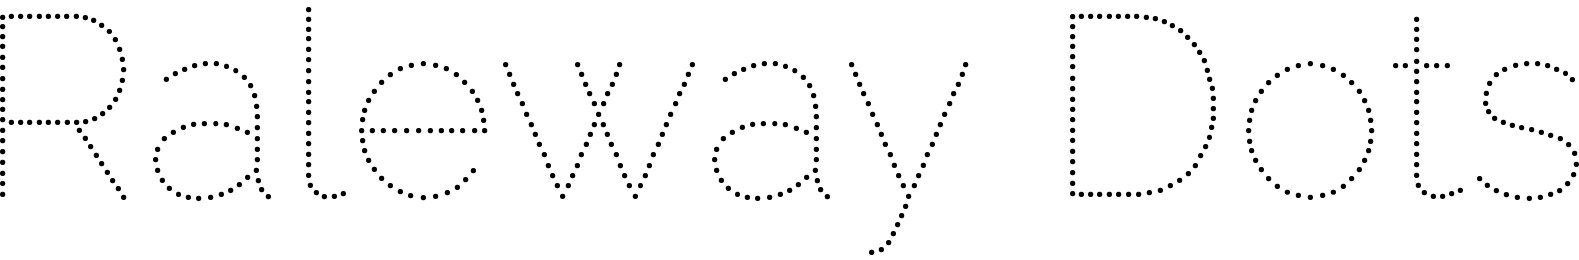 Raleway Dots